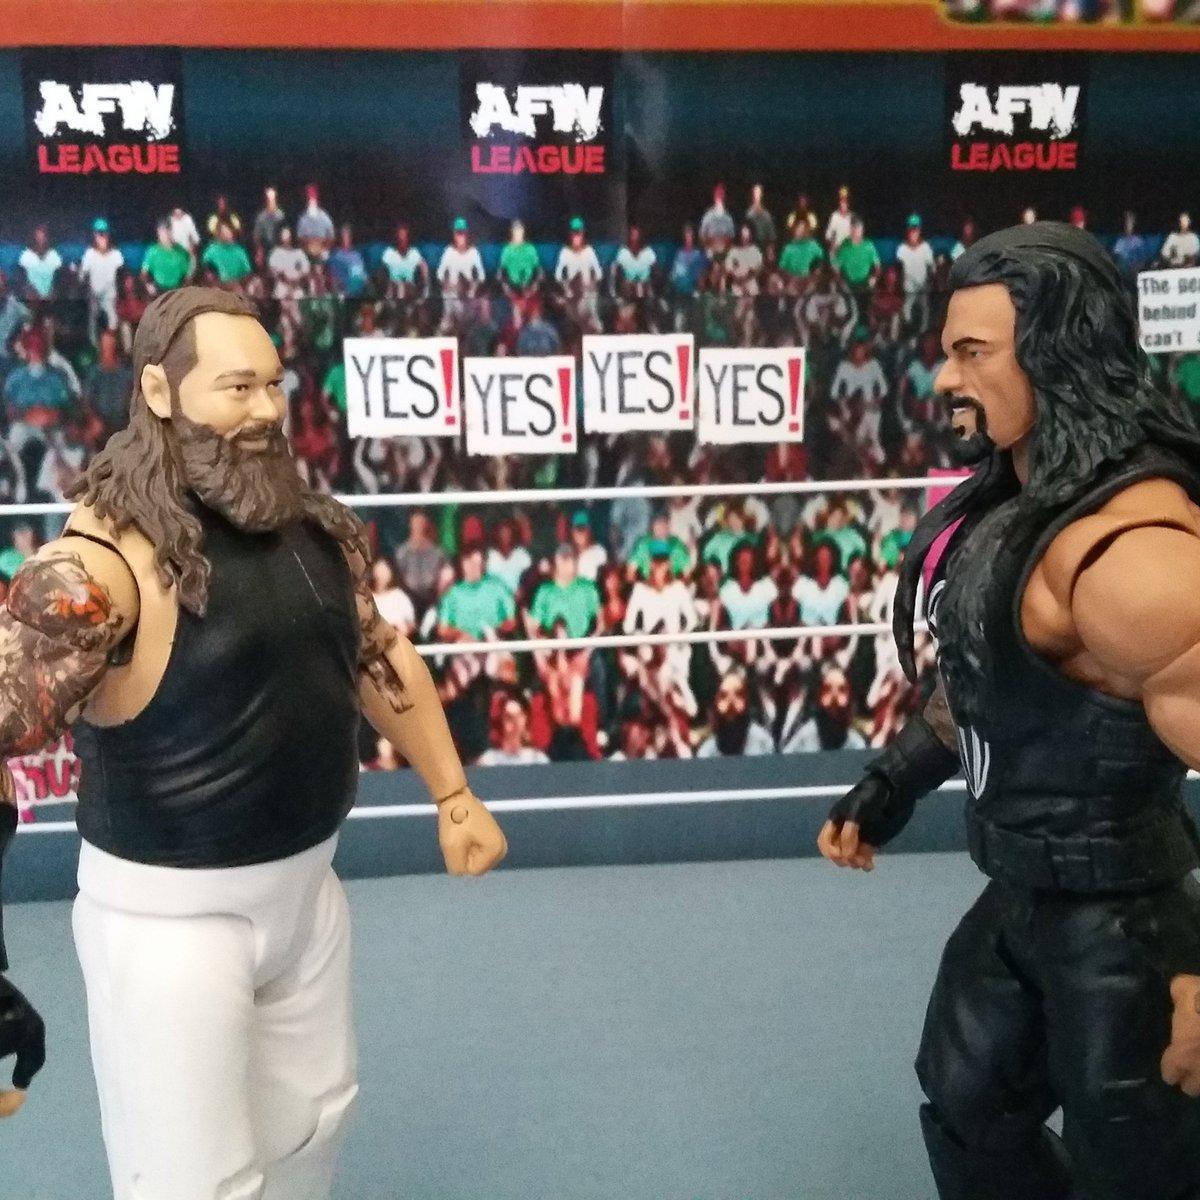 Hello my old friend!! #braywyatt vs #RomanReigns coming soon to AFW. #wwe #raw #smackdown #RoyalRumble #nxt #wrestlemania #mattel #wrestling<br>http://pic.twitter.com/WPazGFQ0jb